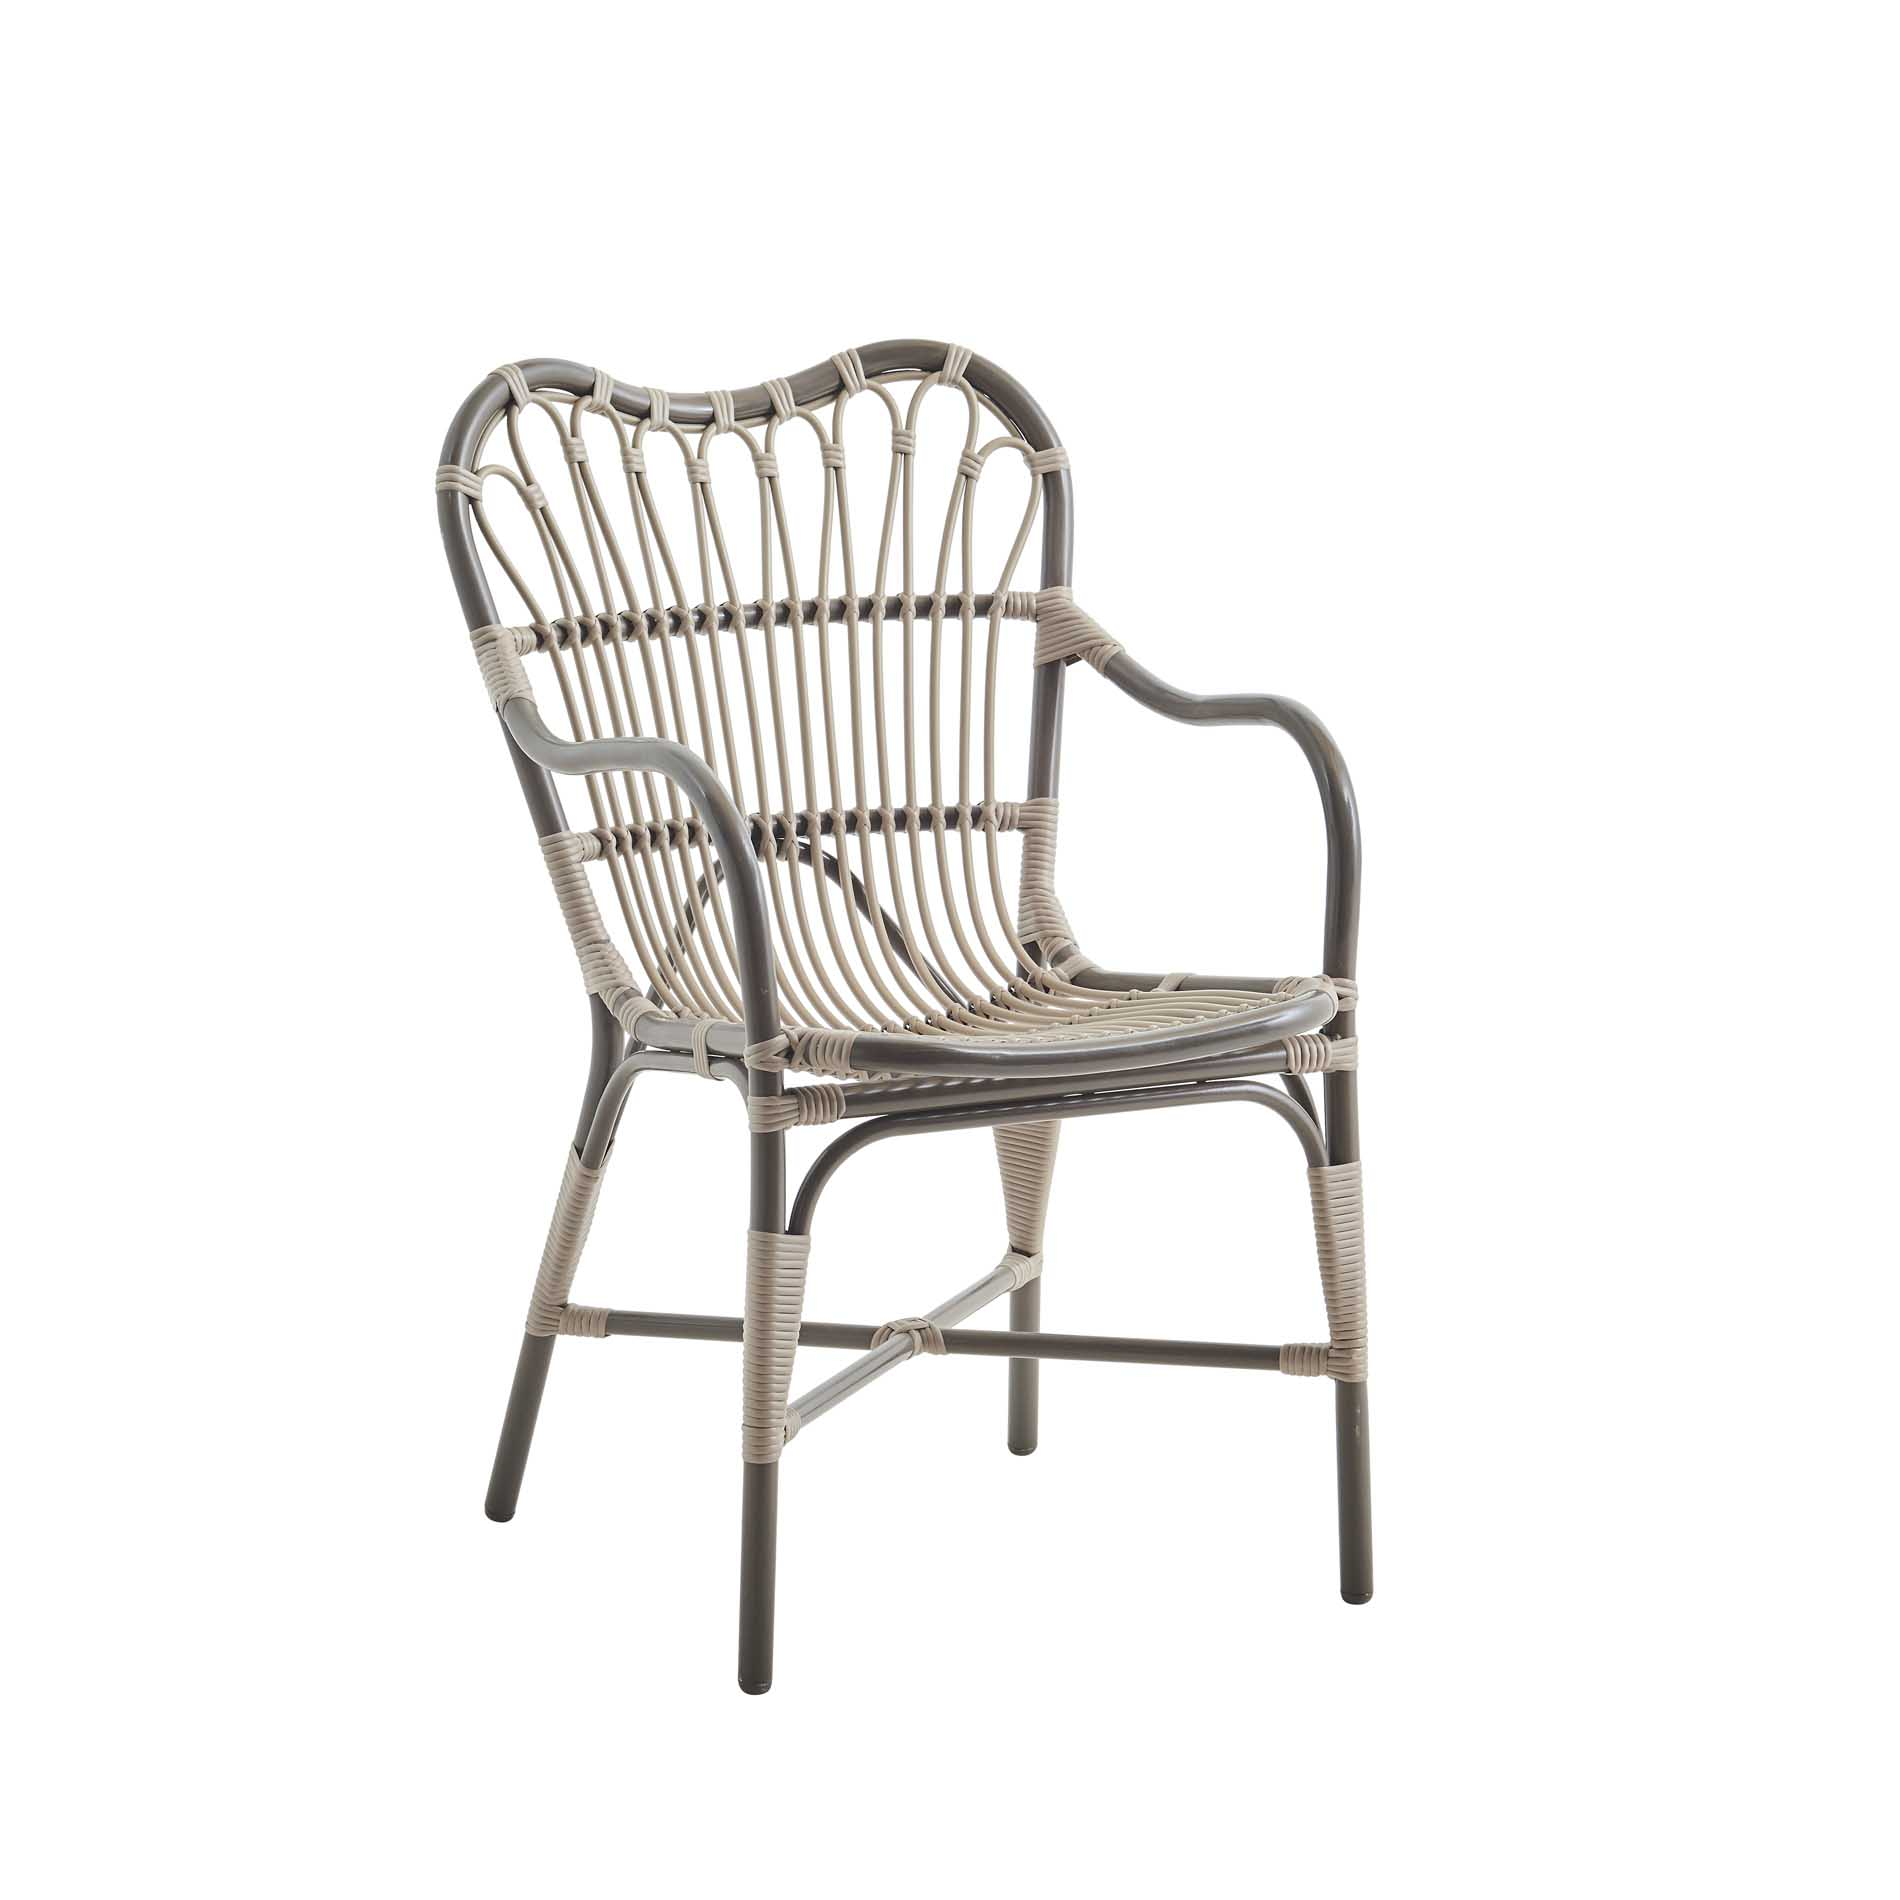 Chaise repas en aluminium et fibre synthétique moccaccino